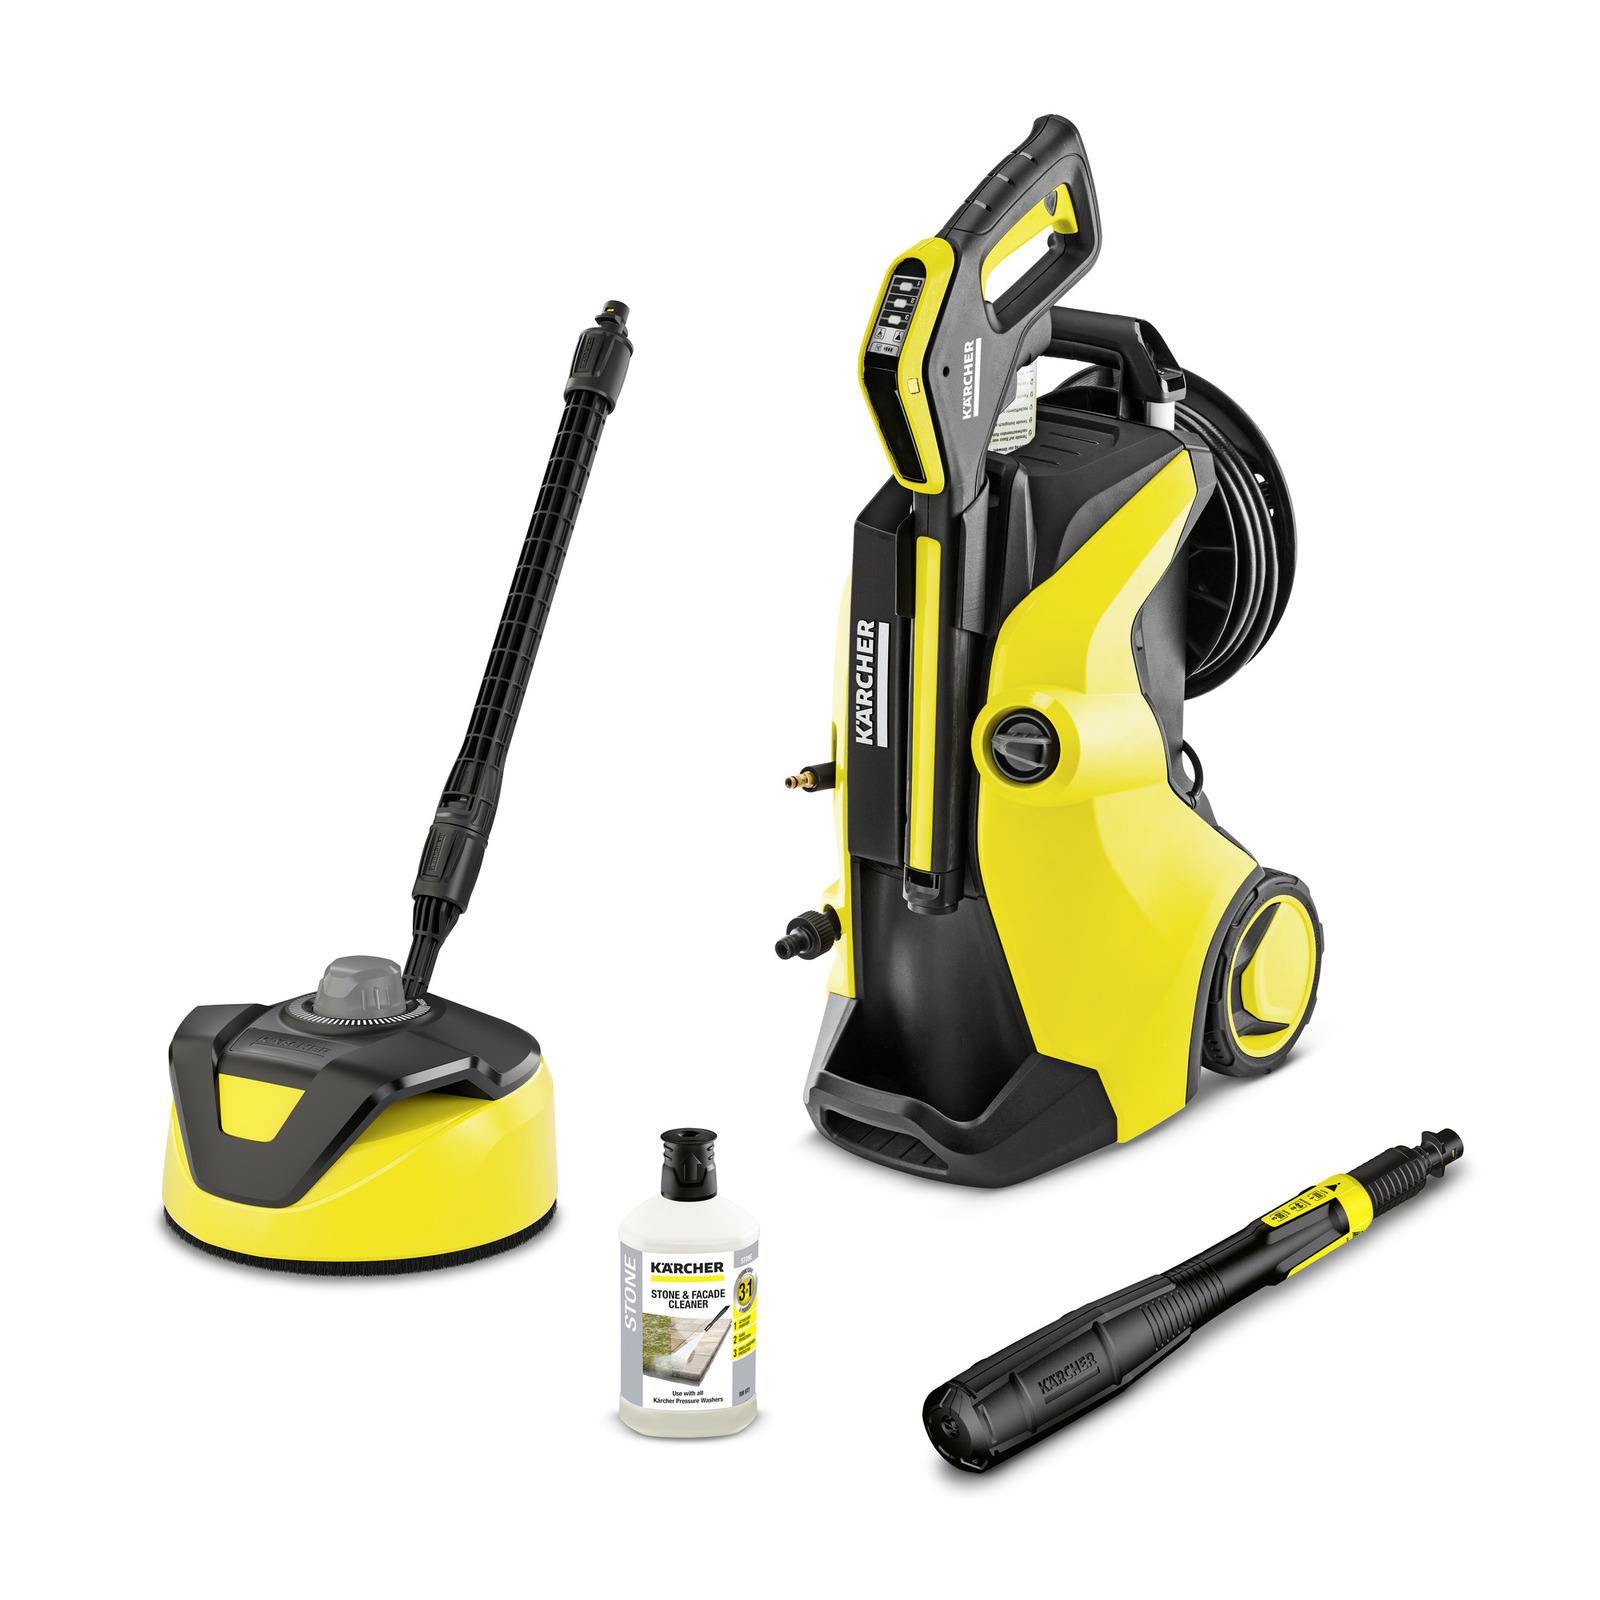 KARCHER 1.324-635.0 - K5 Premium Full Control Plus Home High Pressure Washer